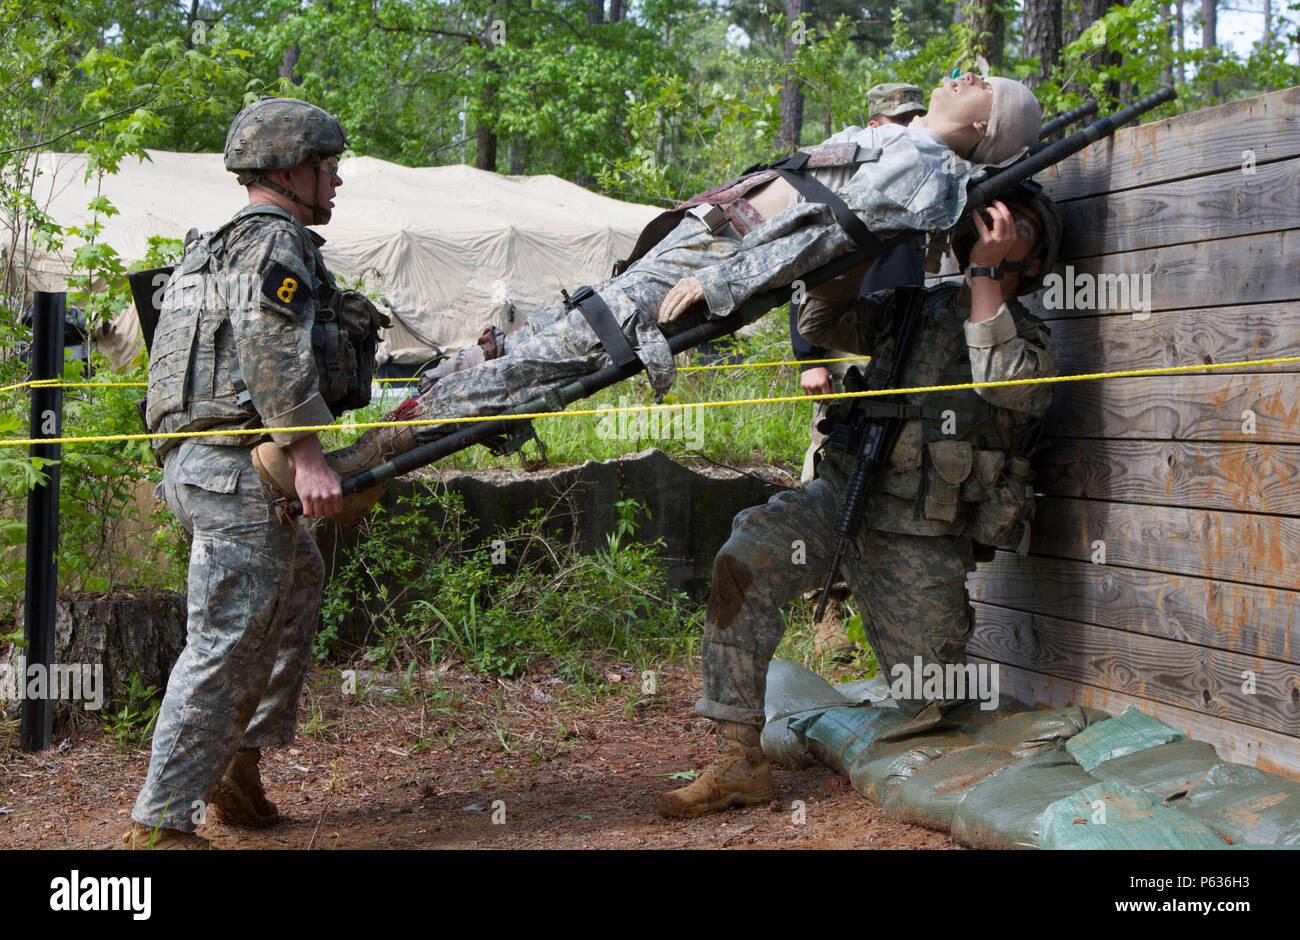 U S Army Spc David Left Imágenes De Stock & U S Army Spc David Left ...